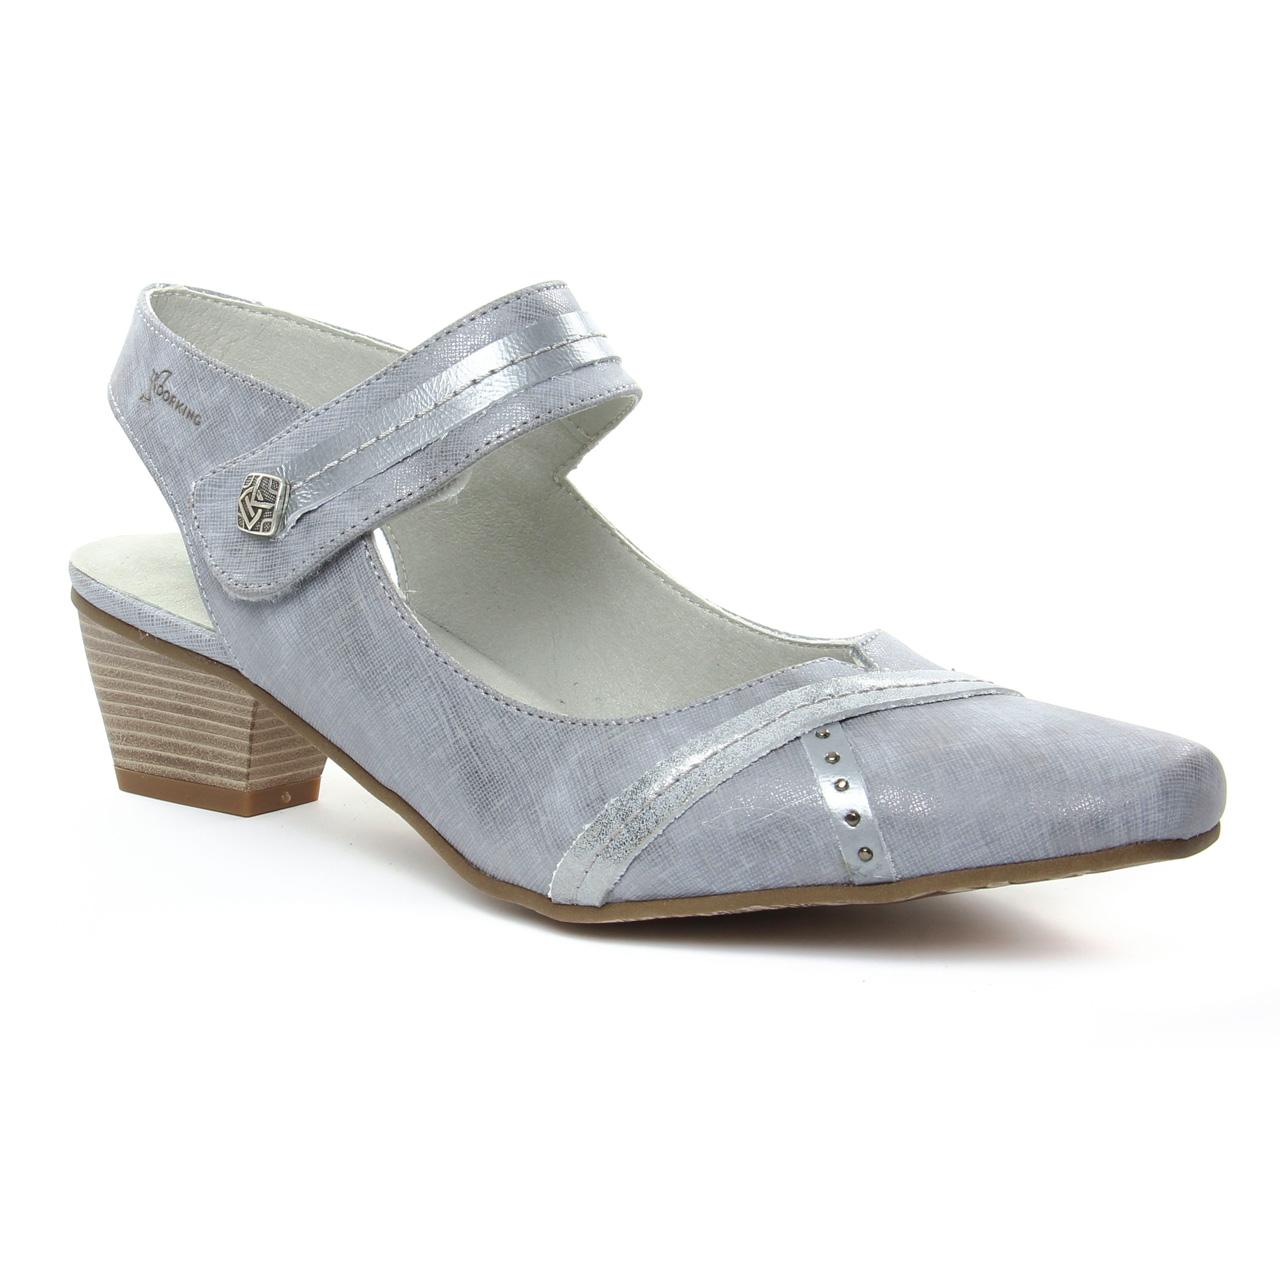 Chaussures Dorking grises Casual femme 9Uiisj8